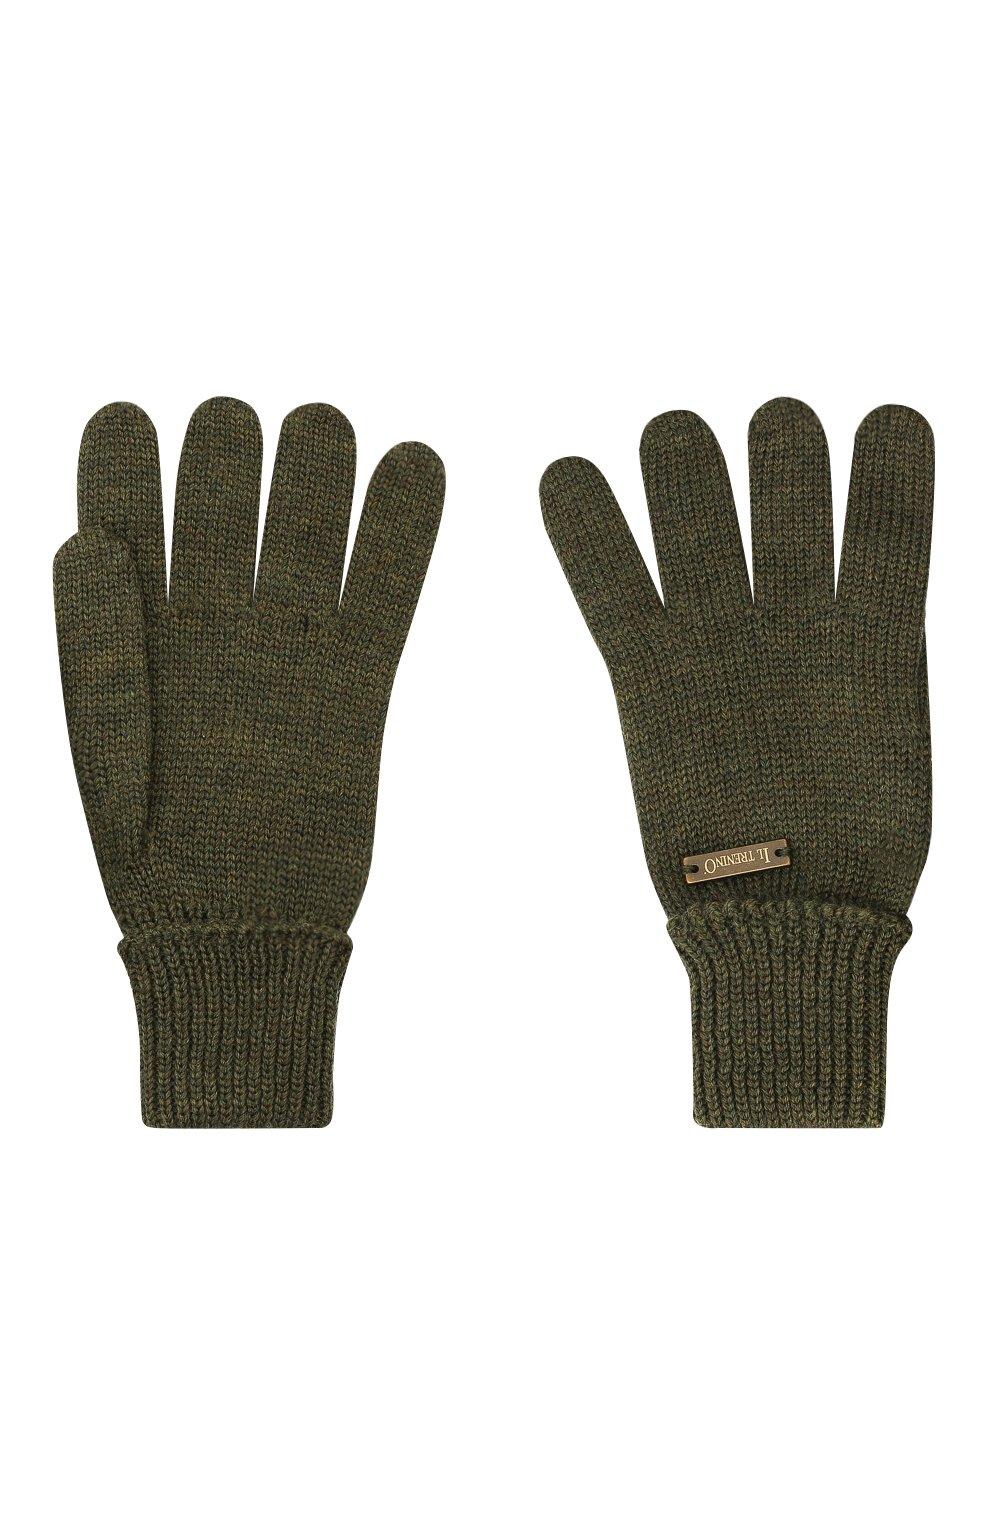 Детские шерстяные перчатки IL TRENINO хаки цвета, арт. 20 4055/E0   Фото 2